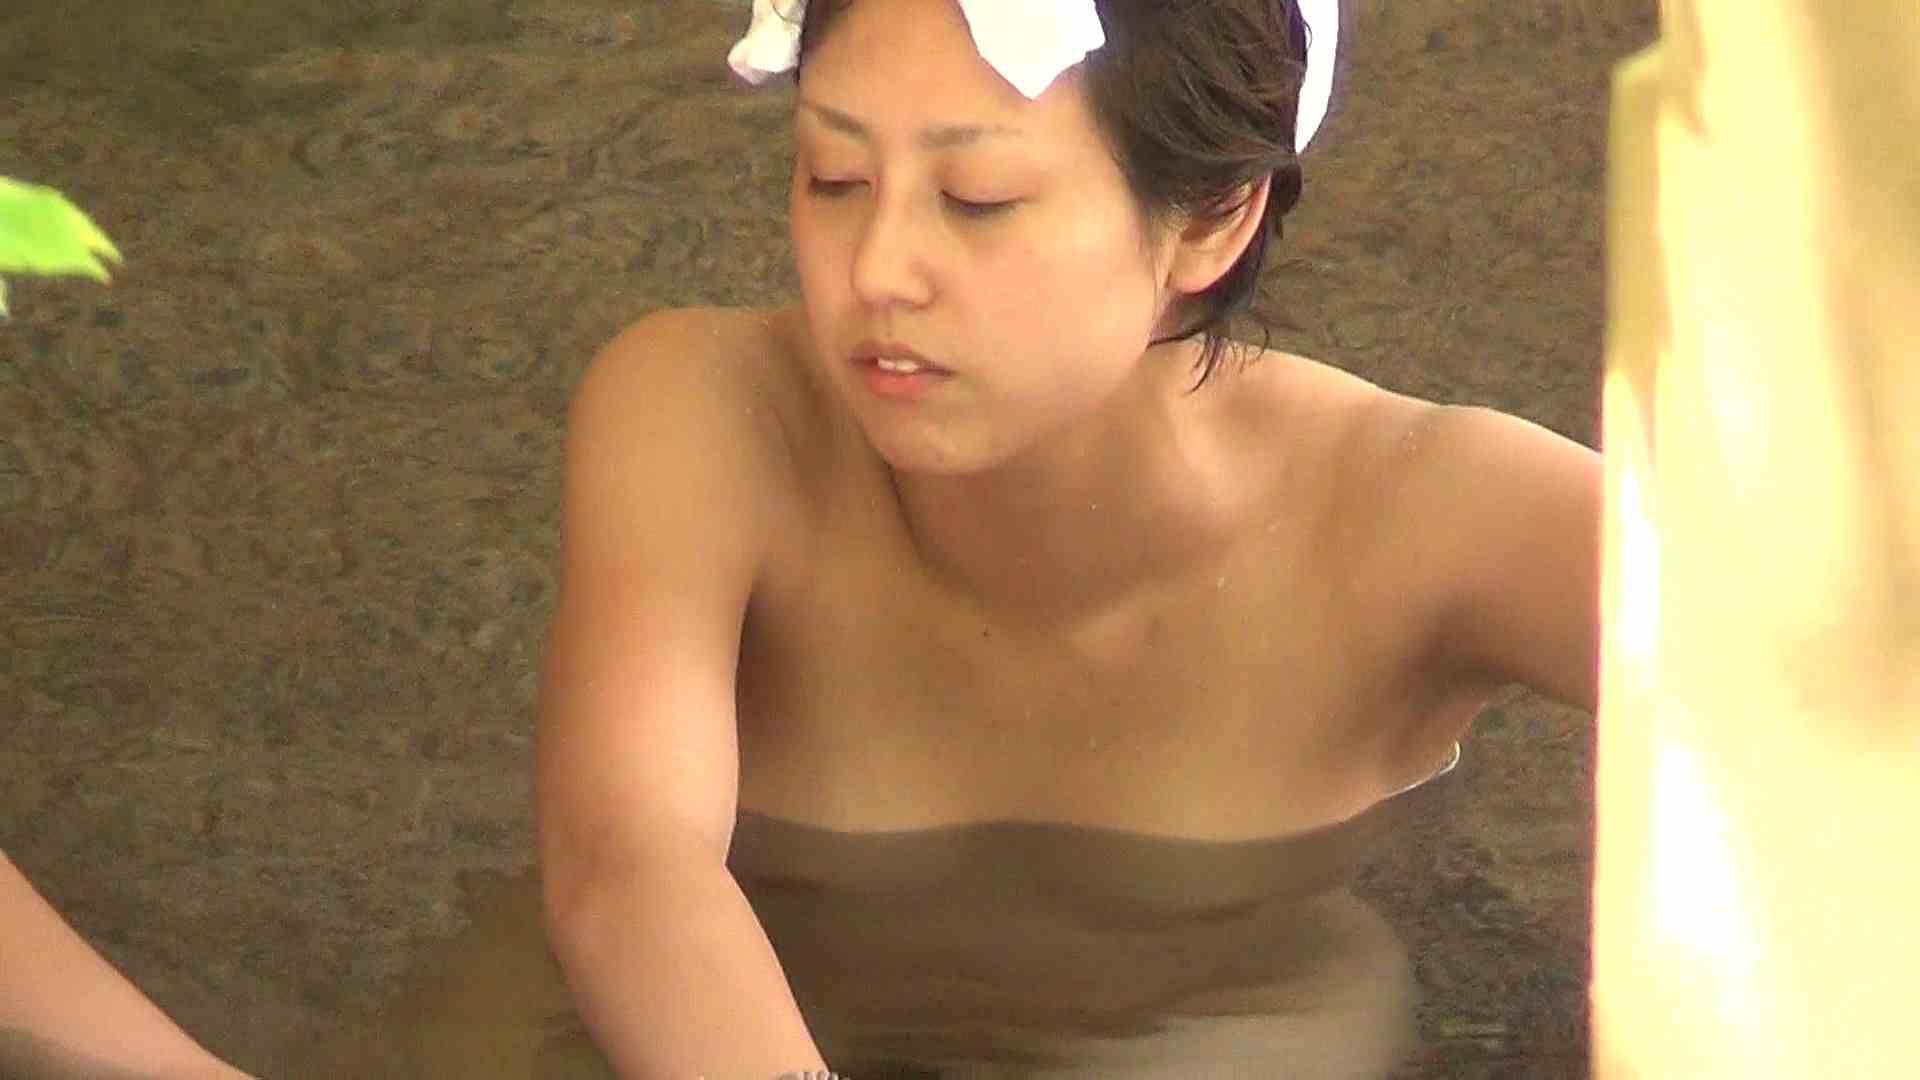 Aquaな露天風呂Vol.243 OLのエロ生活   露天風呂  57連発 40